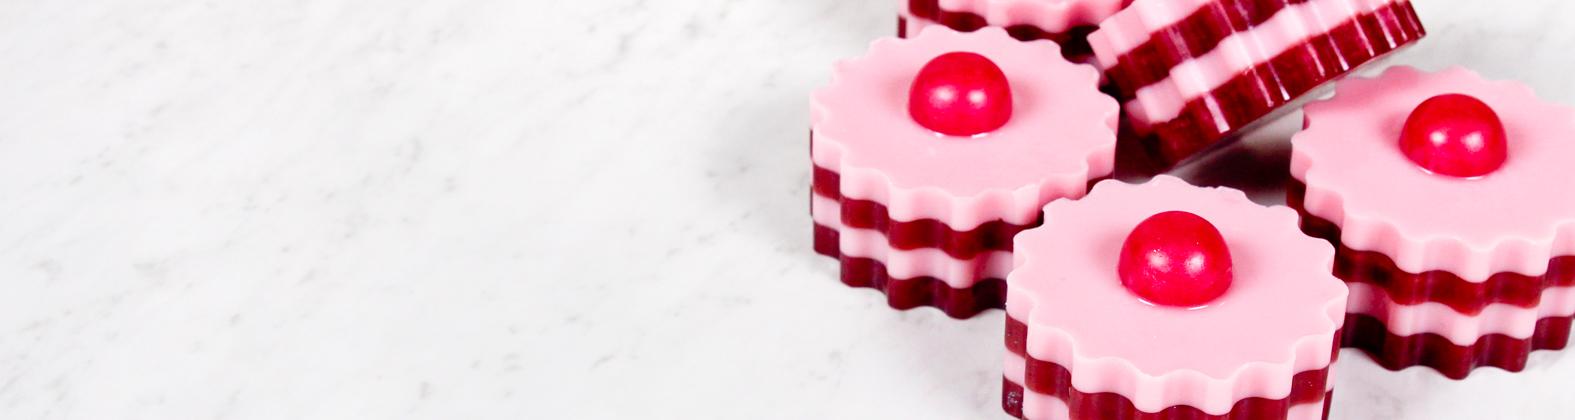 Red Berry Rhubarb Tart